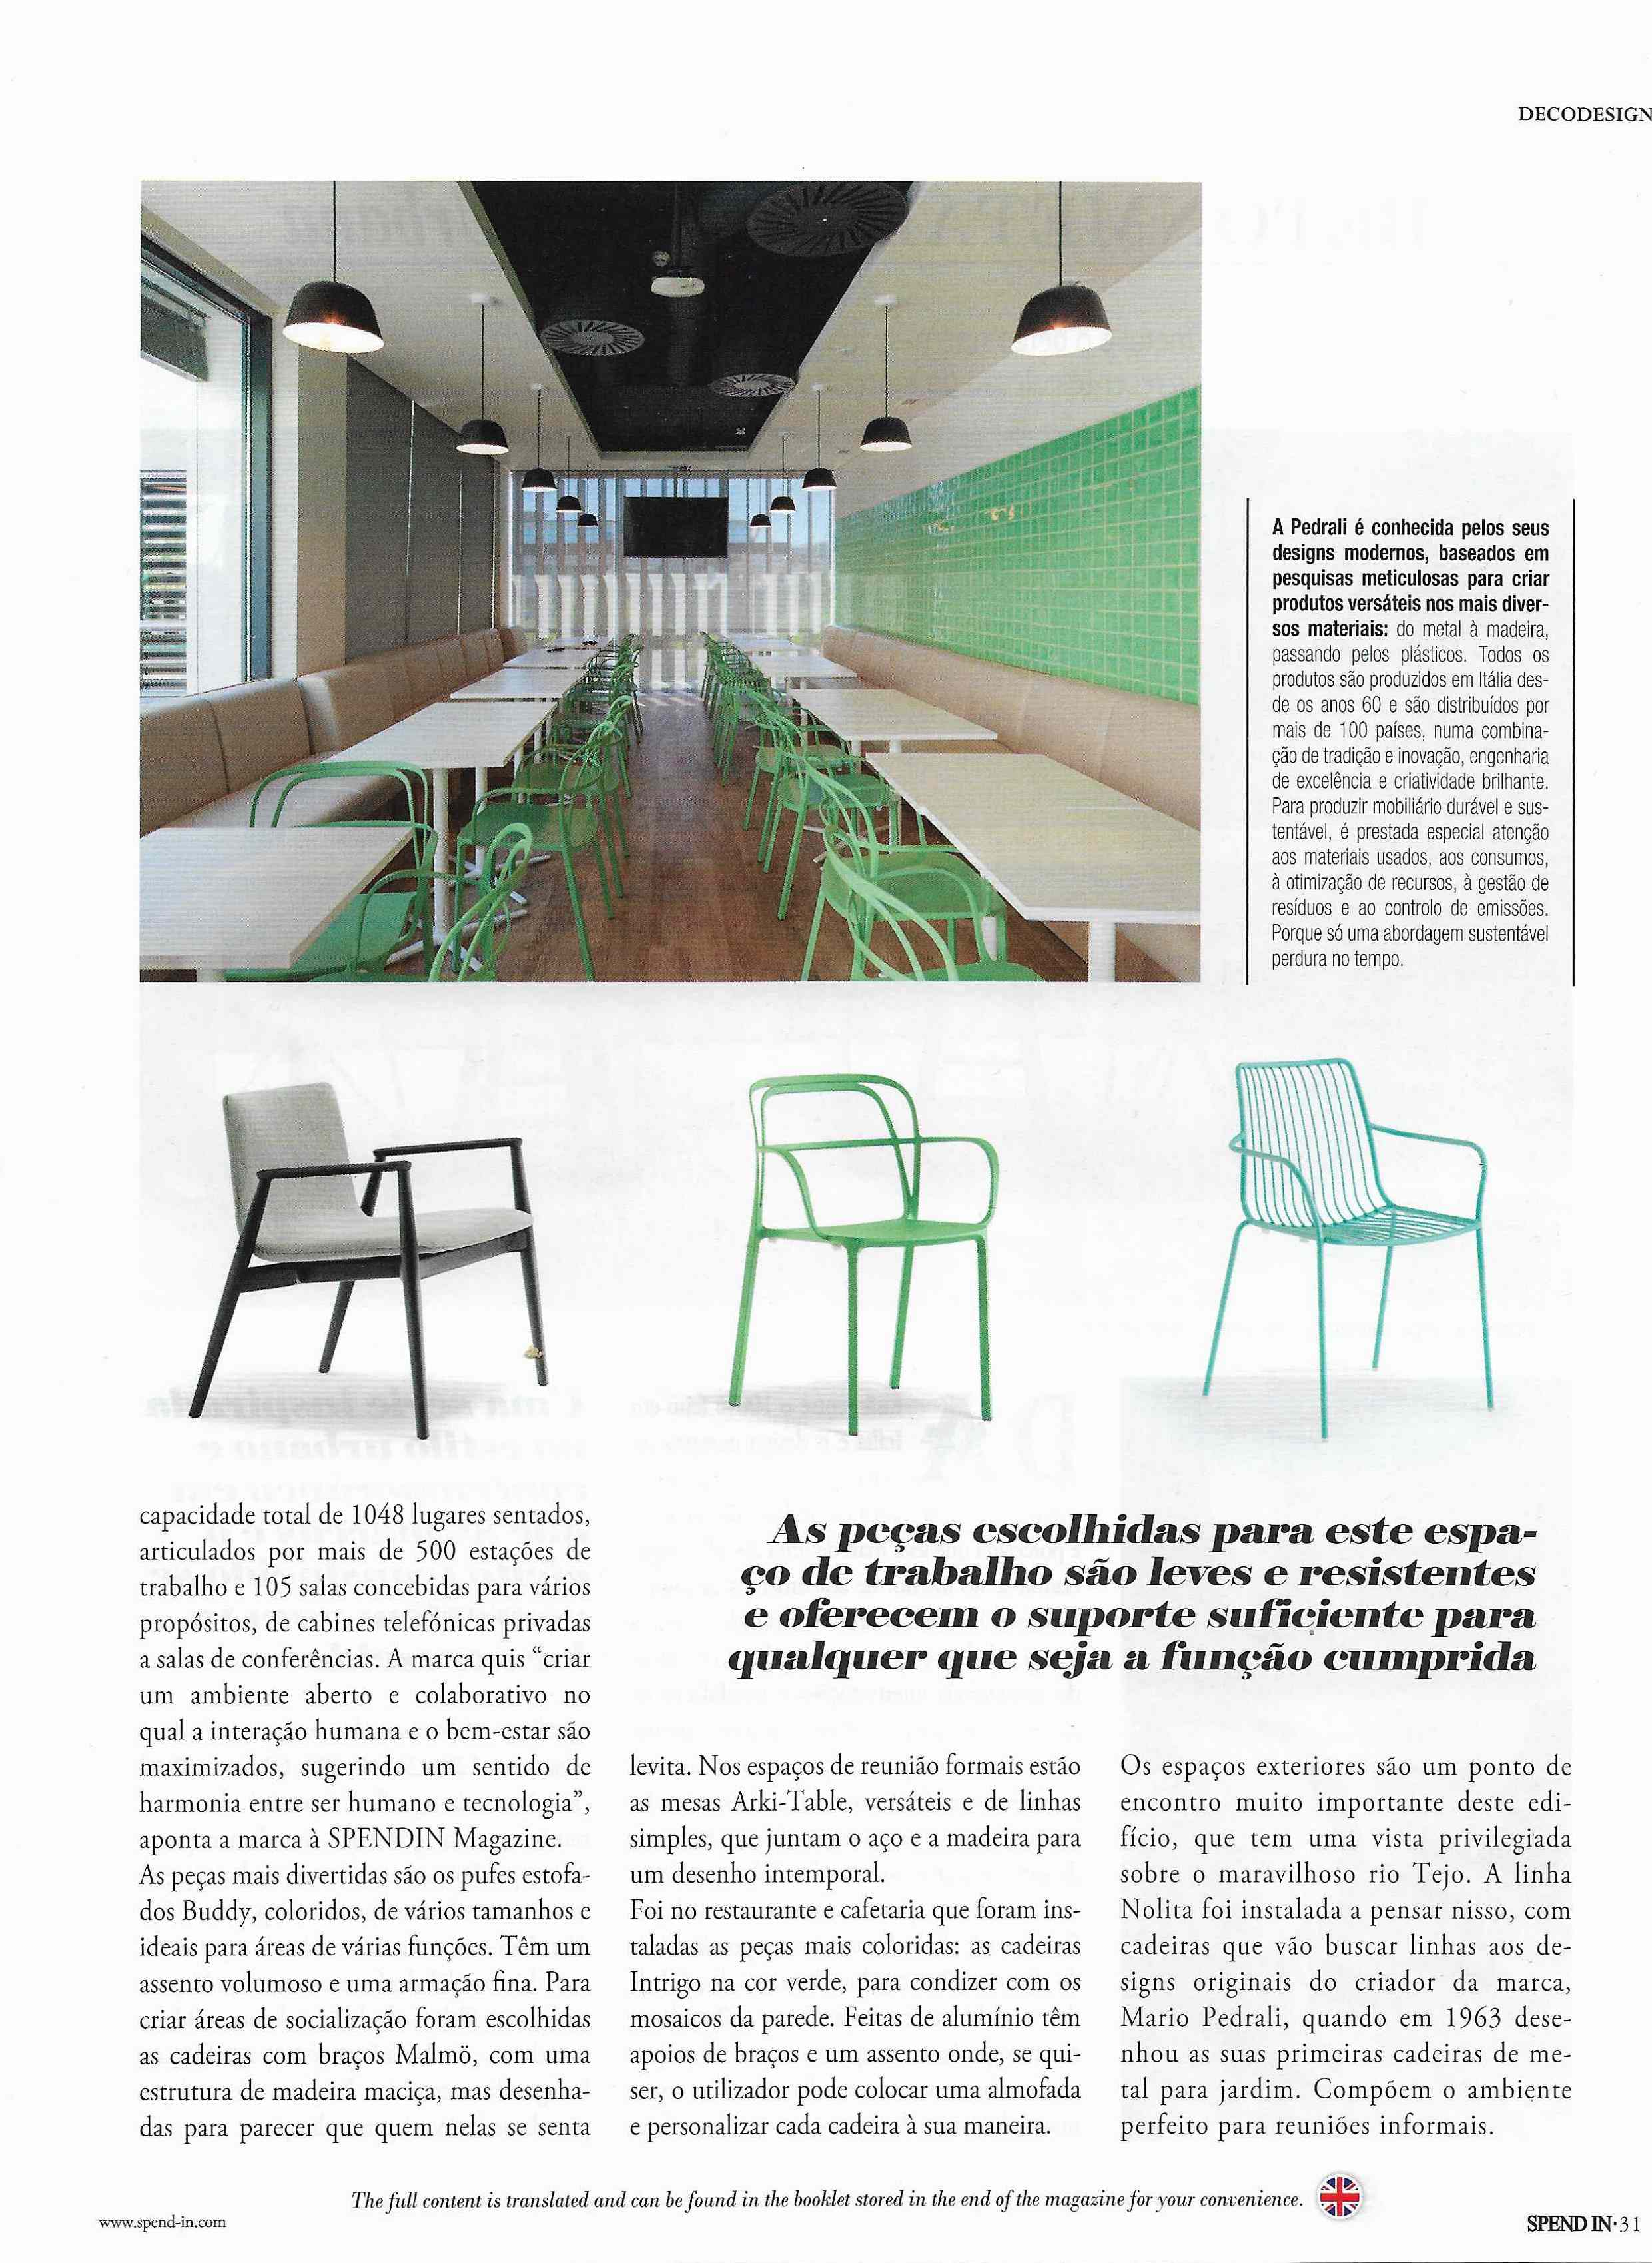 SPEND_IN_Lisbon_Porto_Microsoft_Pedrali_Spring_2021_01